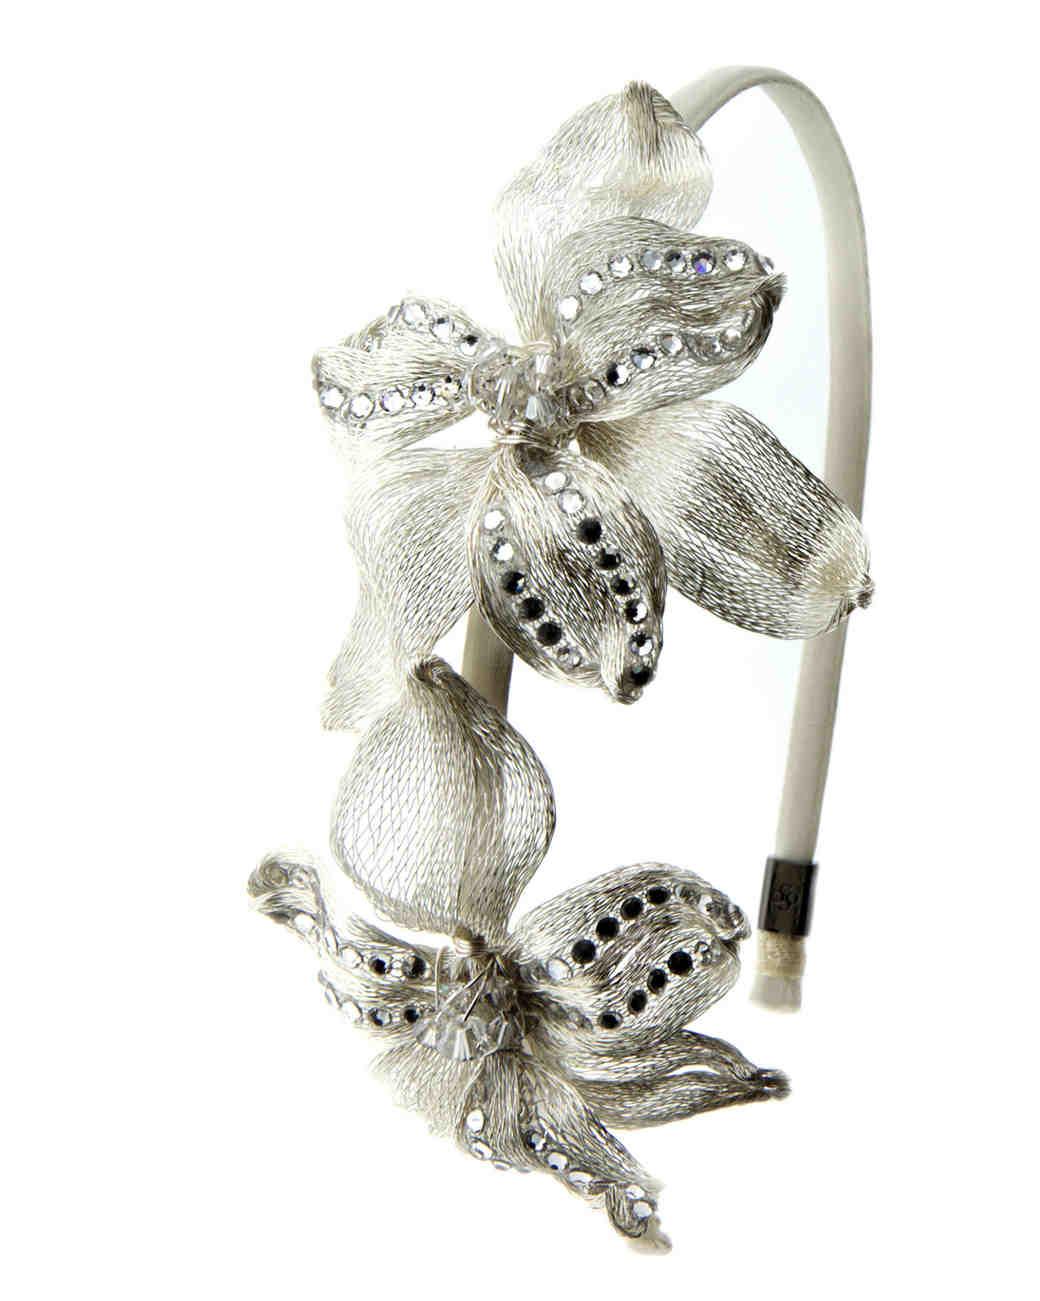 hair-accessories-colette-malouf-headband-1014.jpg